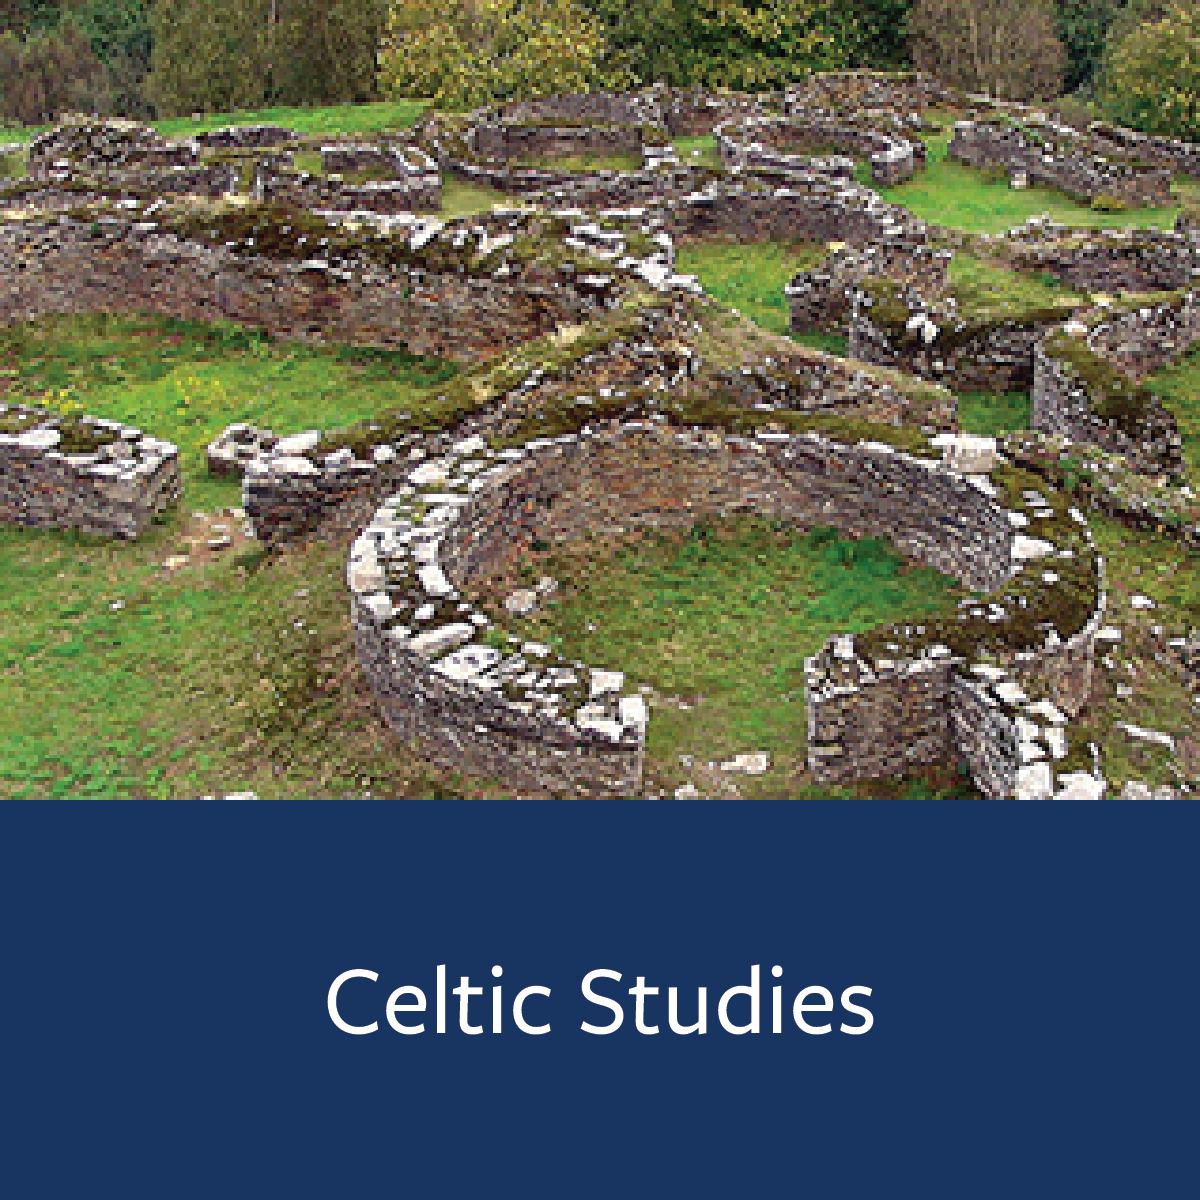 Celtic Studies Major Map